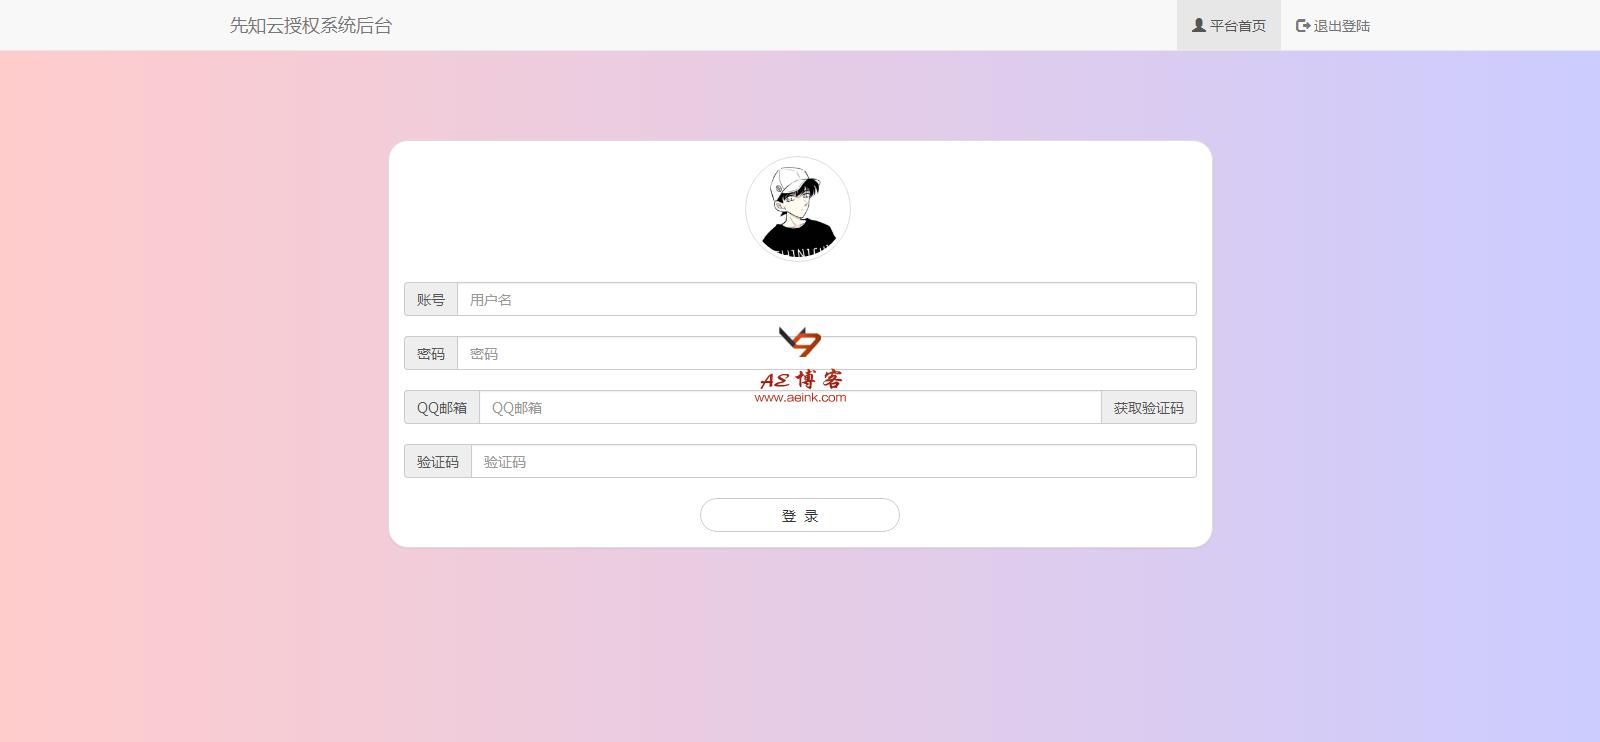 用户登录.png